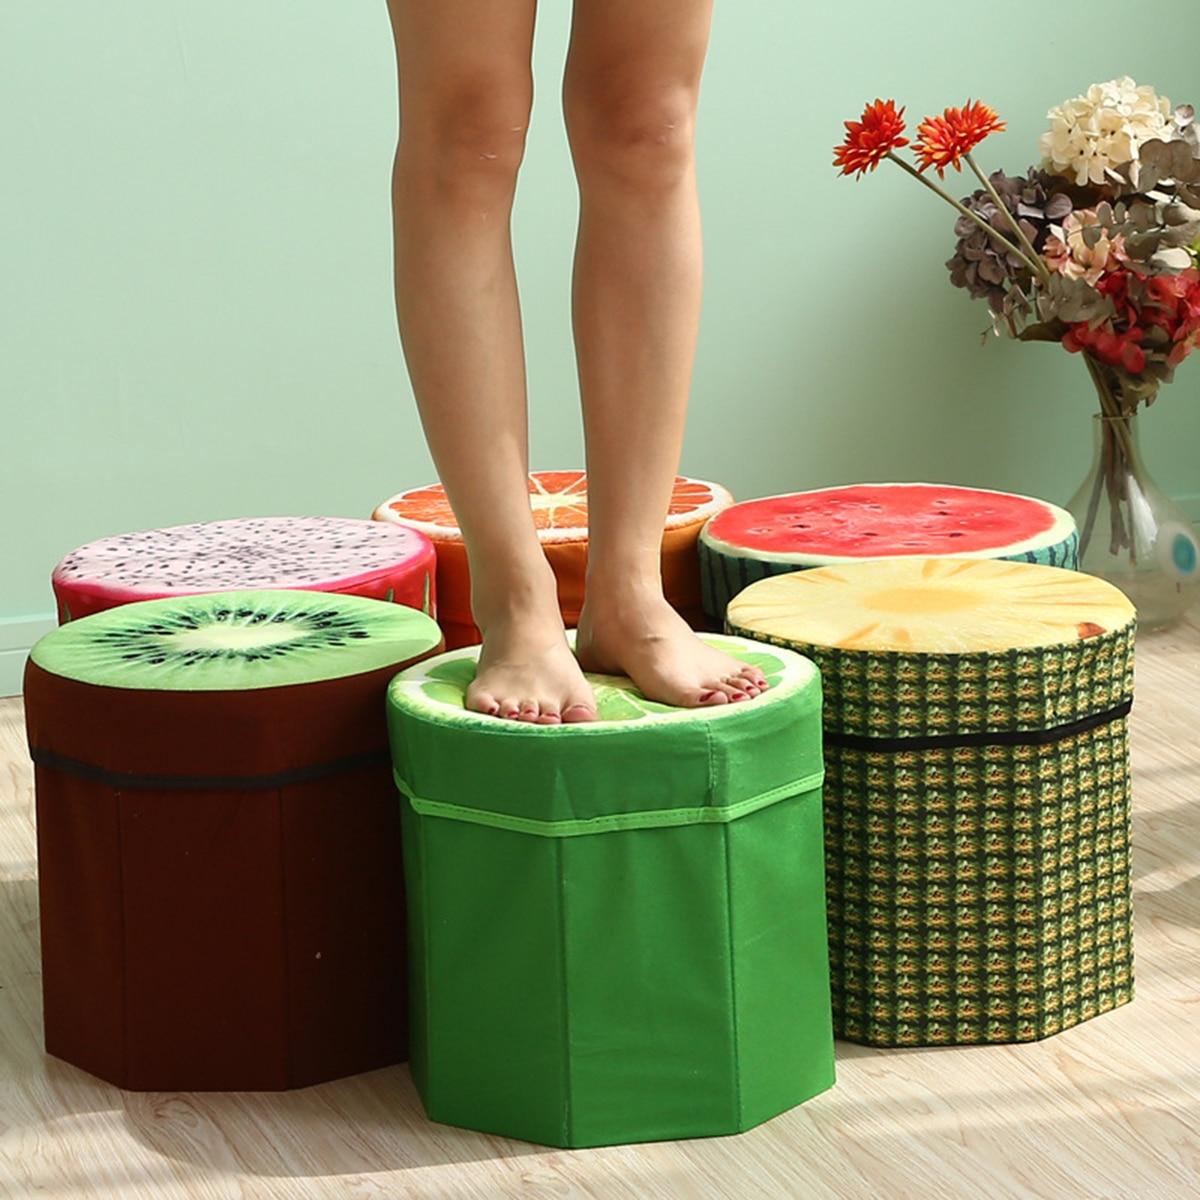 Creative Fruit Folding Storage Organizer Ottoman Stool Footstool Seat Storage Box Size Small Storage Box Organizer